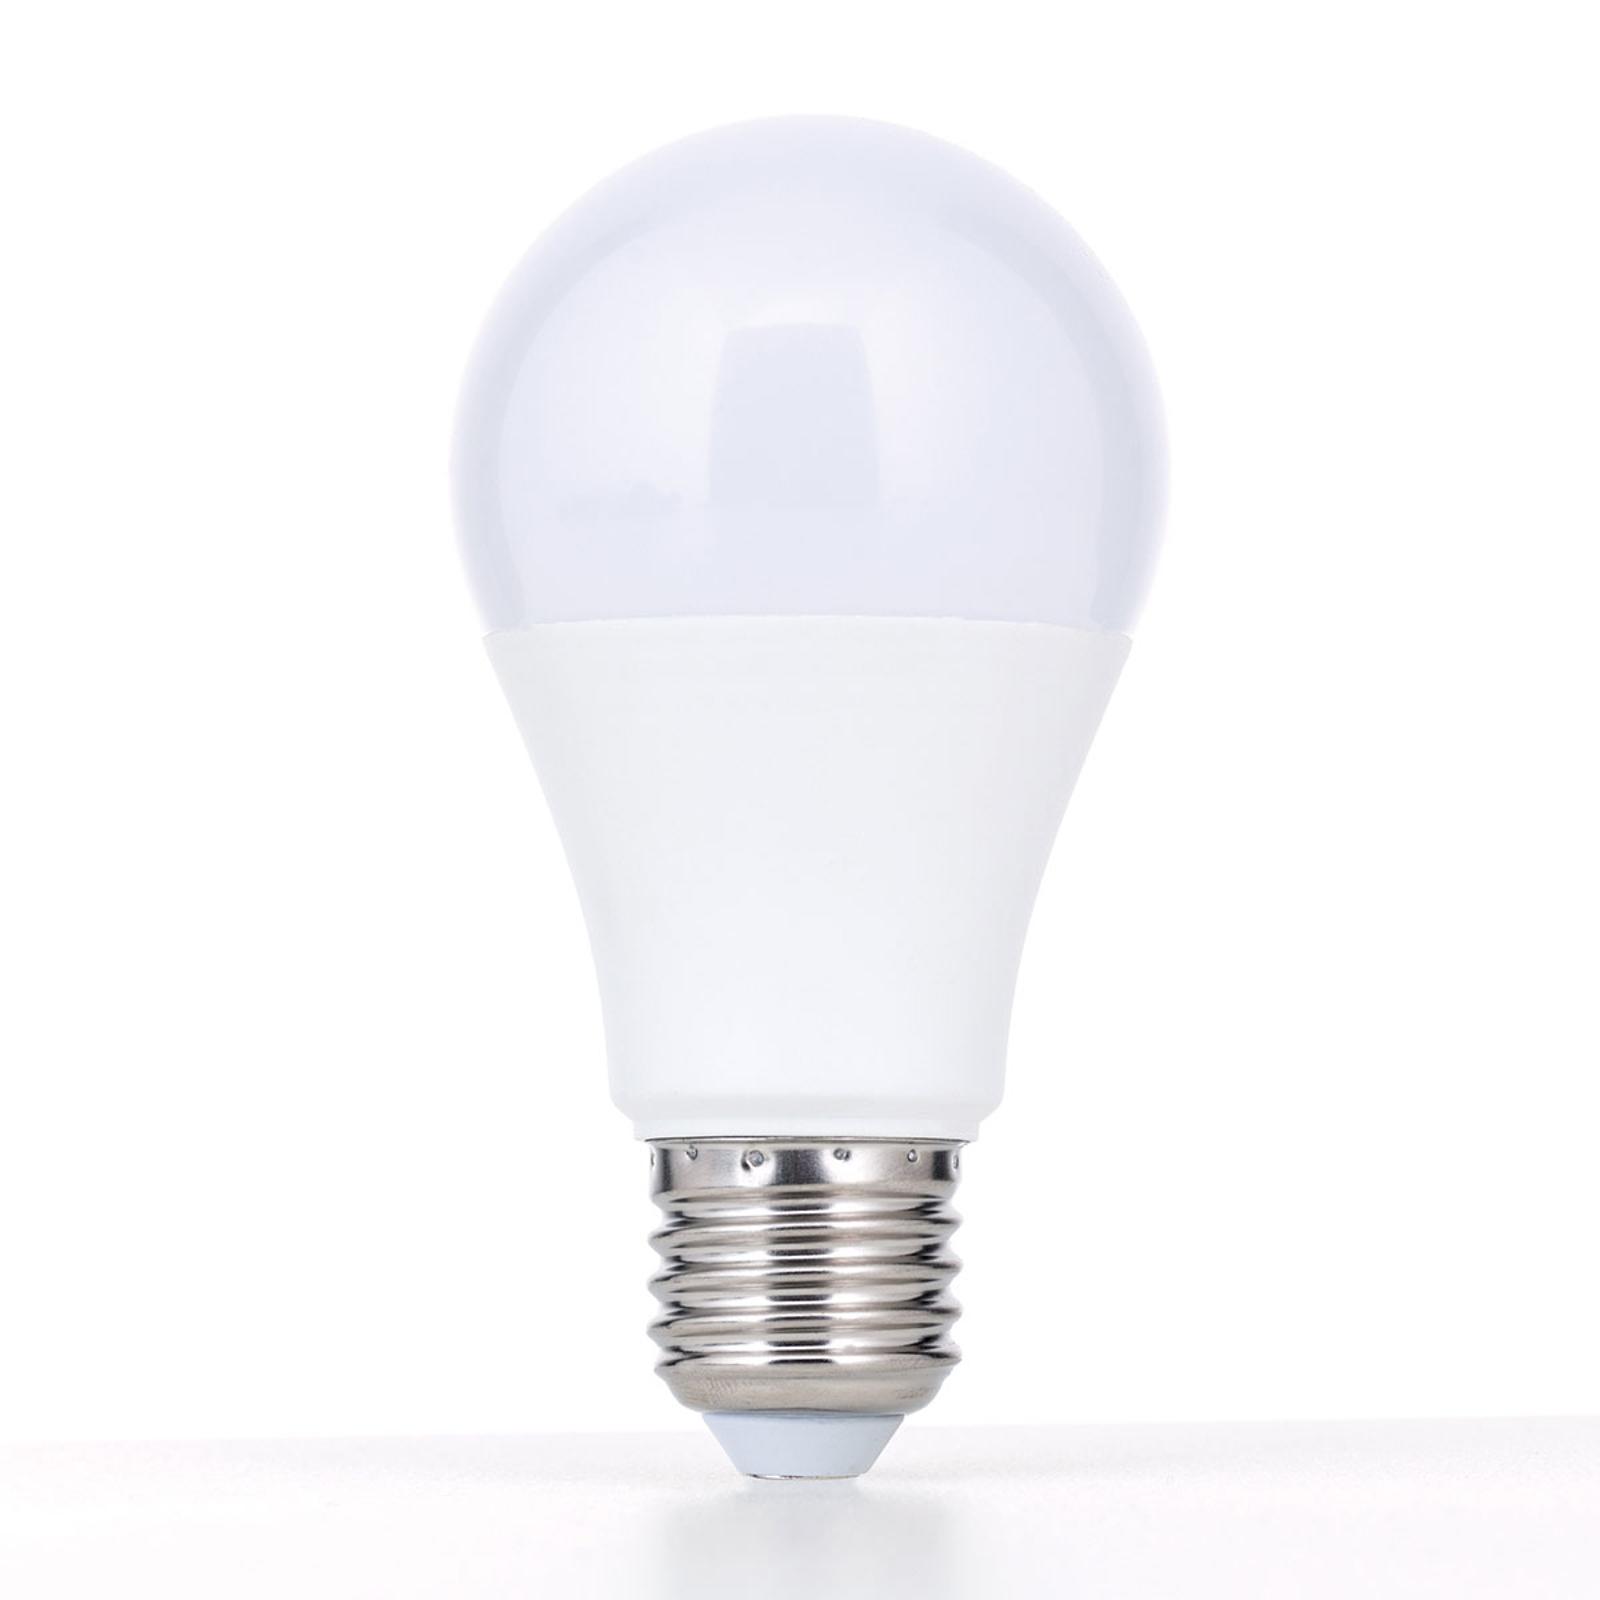 Ampoule LED E27 5W, blanc chaud, non dimmable